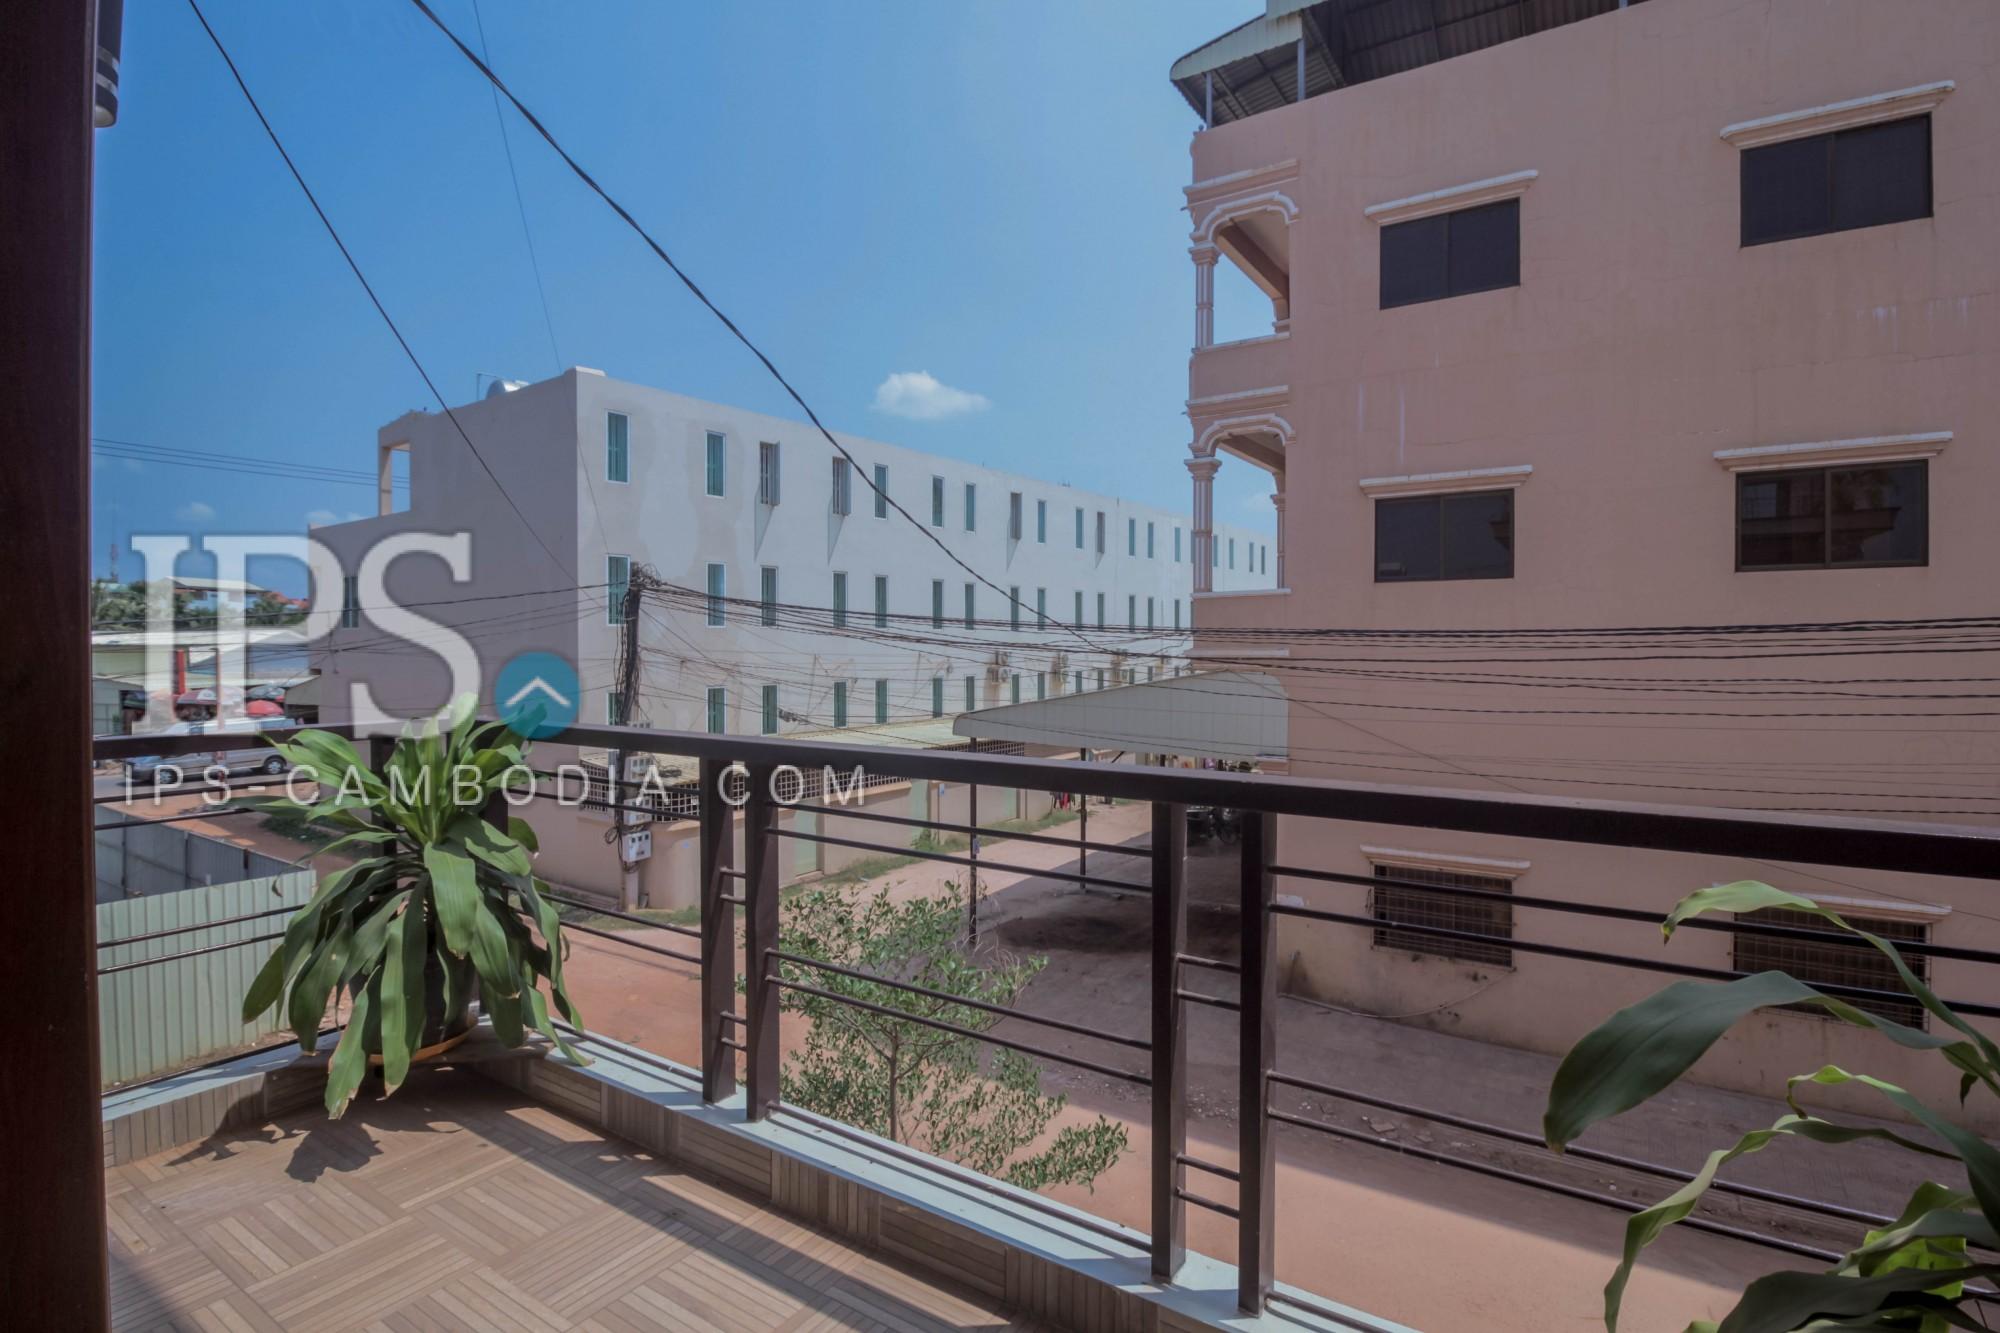 3 BedRooms  Villa  For Rent - Chreav, Siem Reap